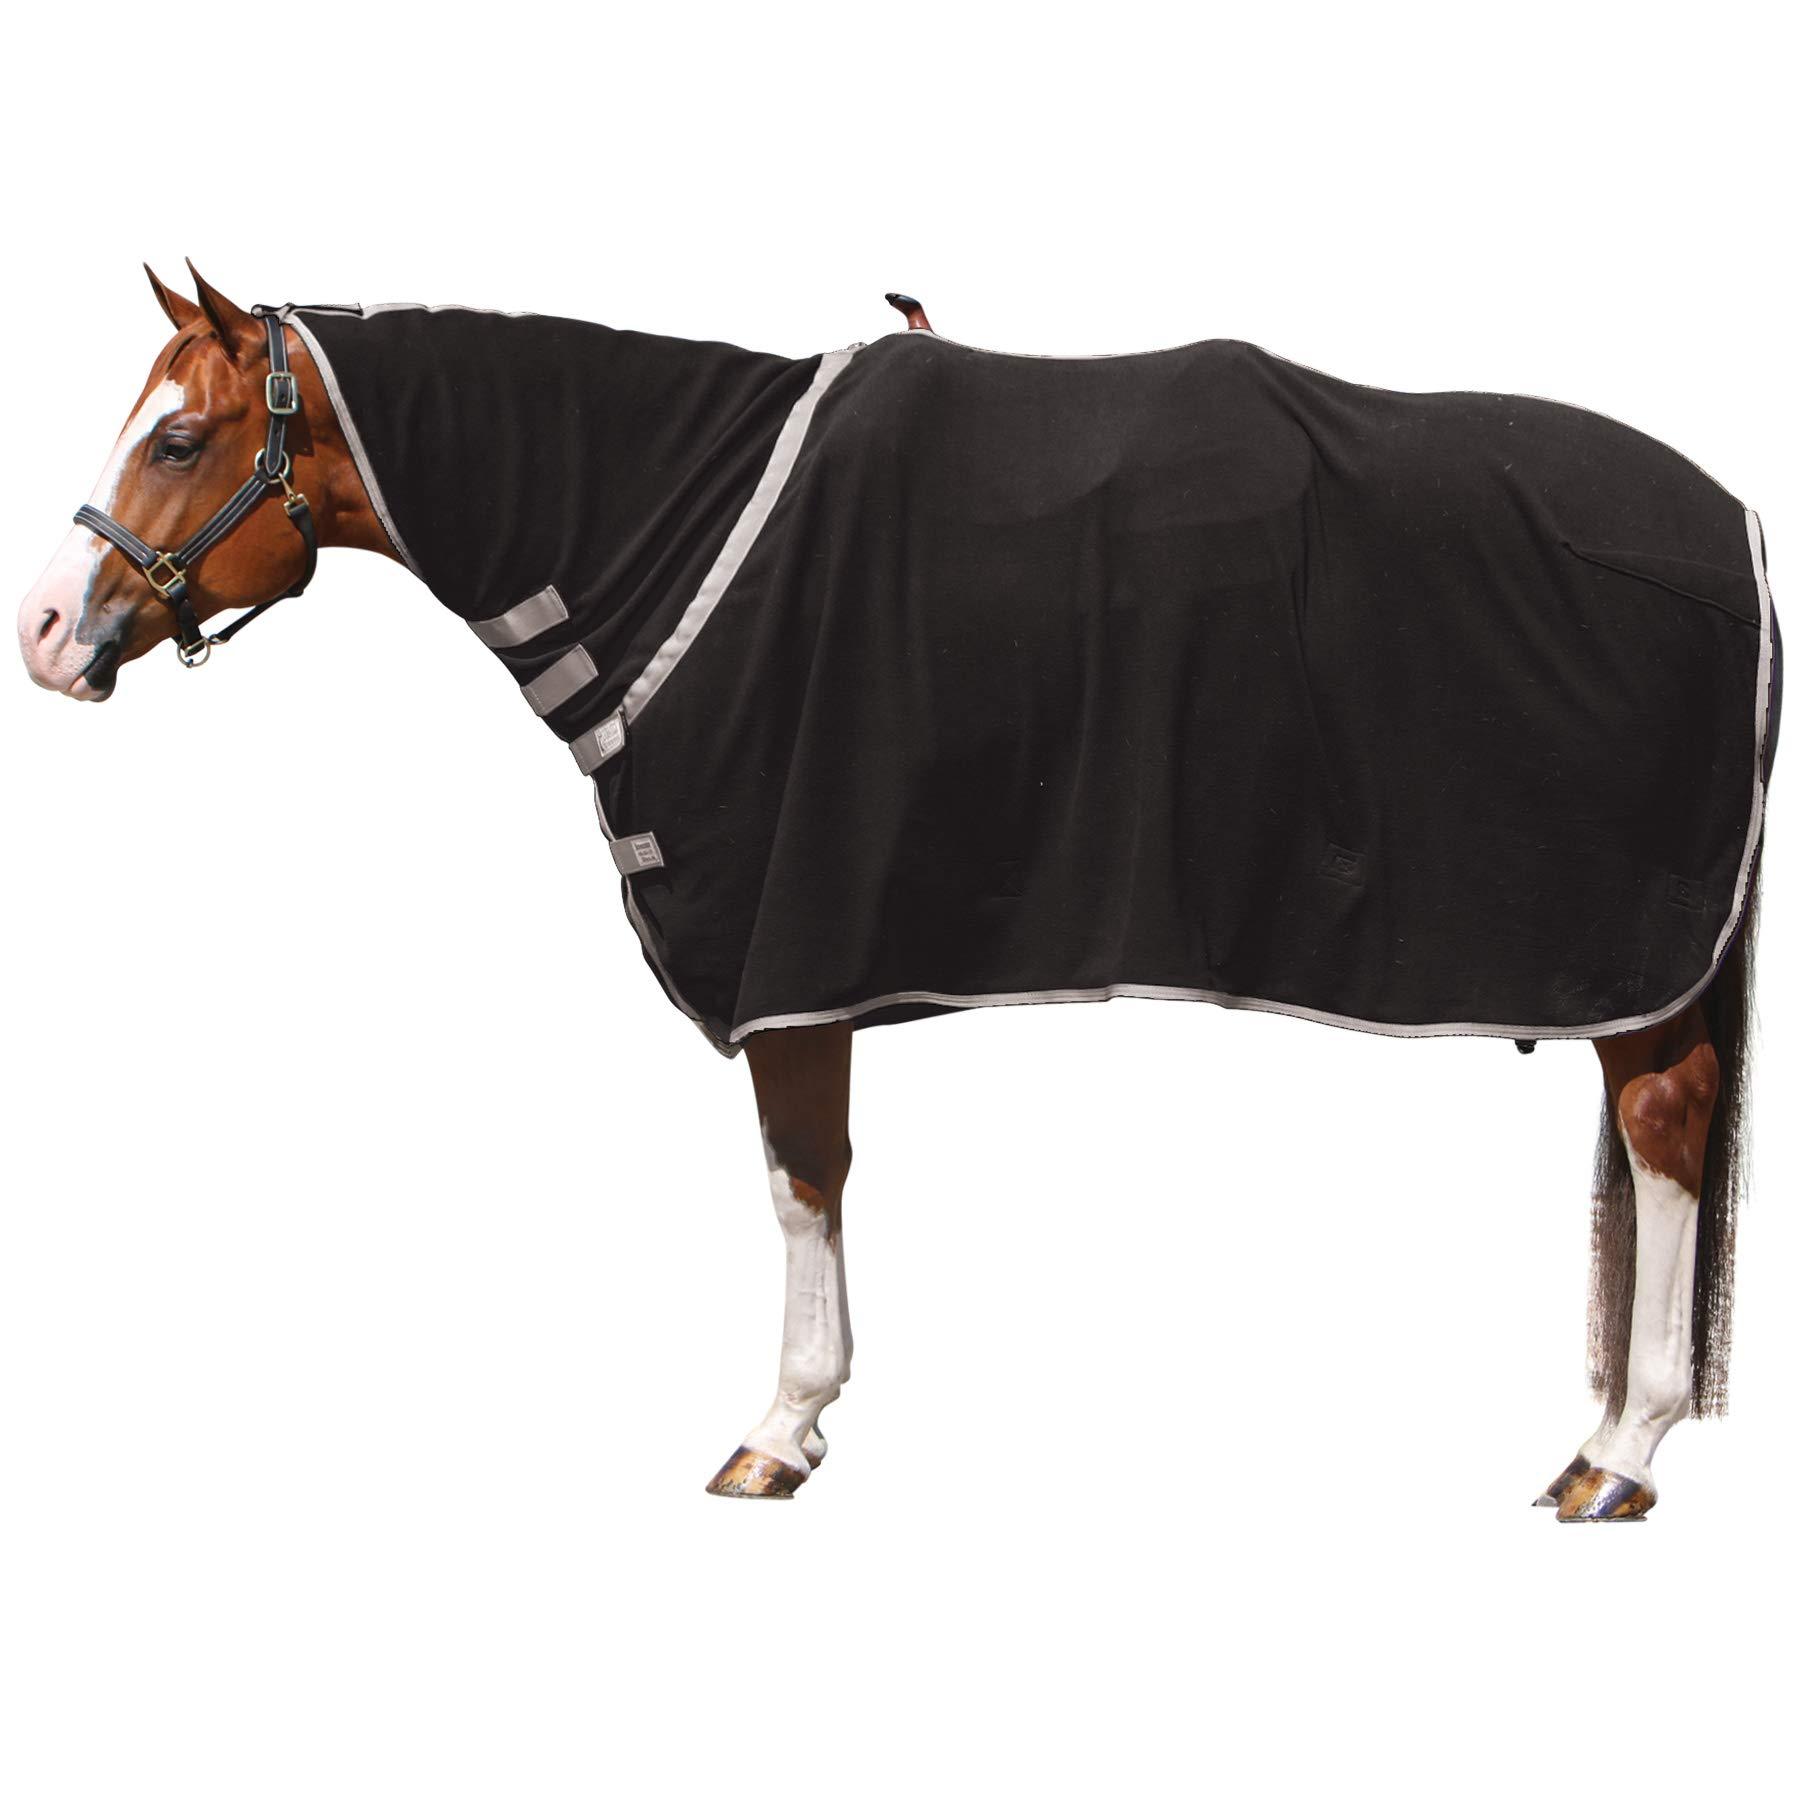 Schneiders Saddlery Dura-Tech Western Performance Contour Fleece Cooler (Large, Black)